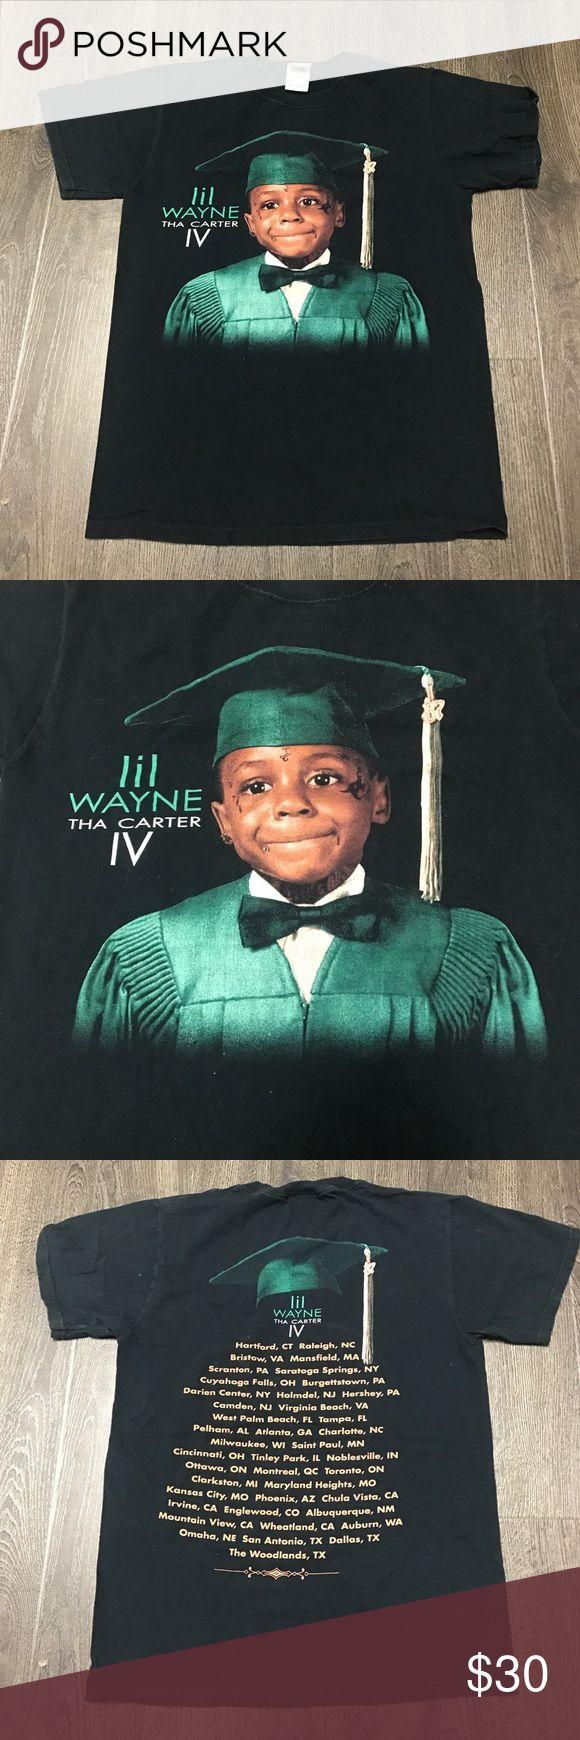 Rap Tee: Lil Wayne Tha Carter IV Tour Shirt Rap Tee: Lil Wayne Tha Carter IV Tour Shirt. Size S. DM for questions! 2011 Supreme Shirts Tees - Short Sleeve